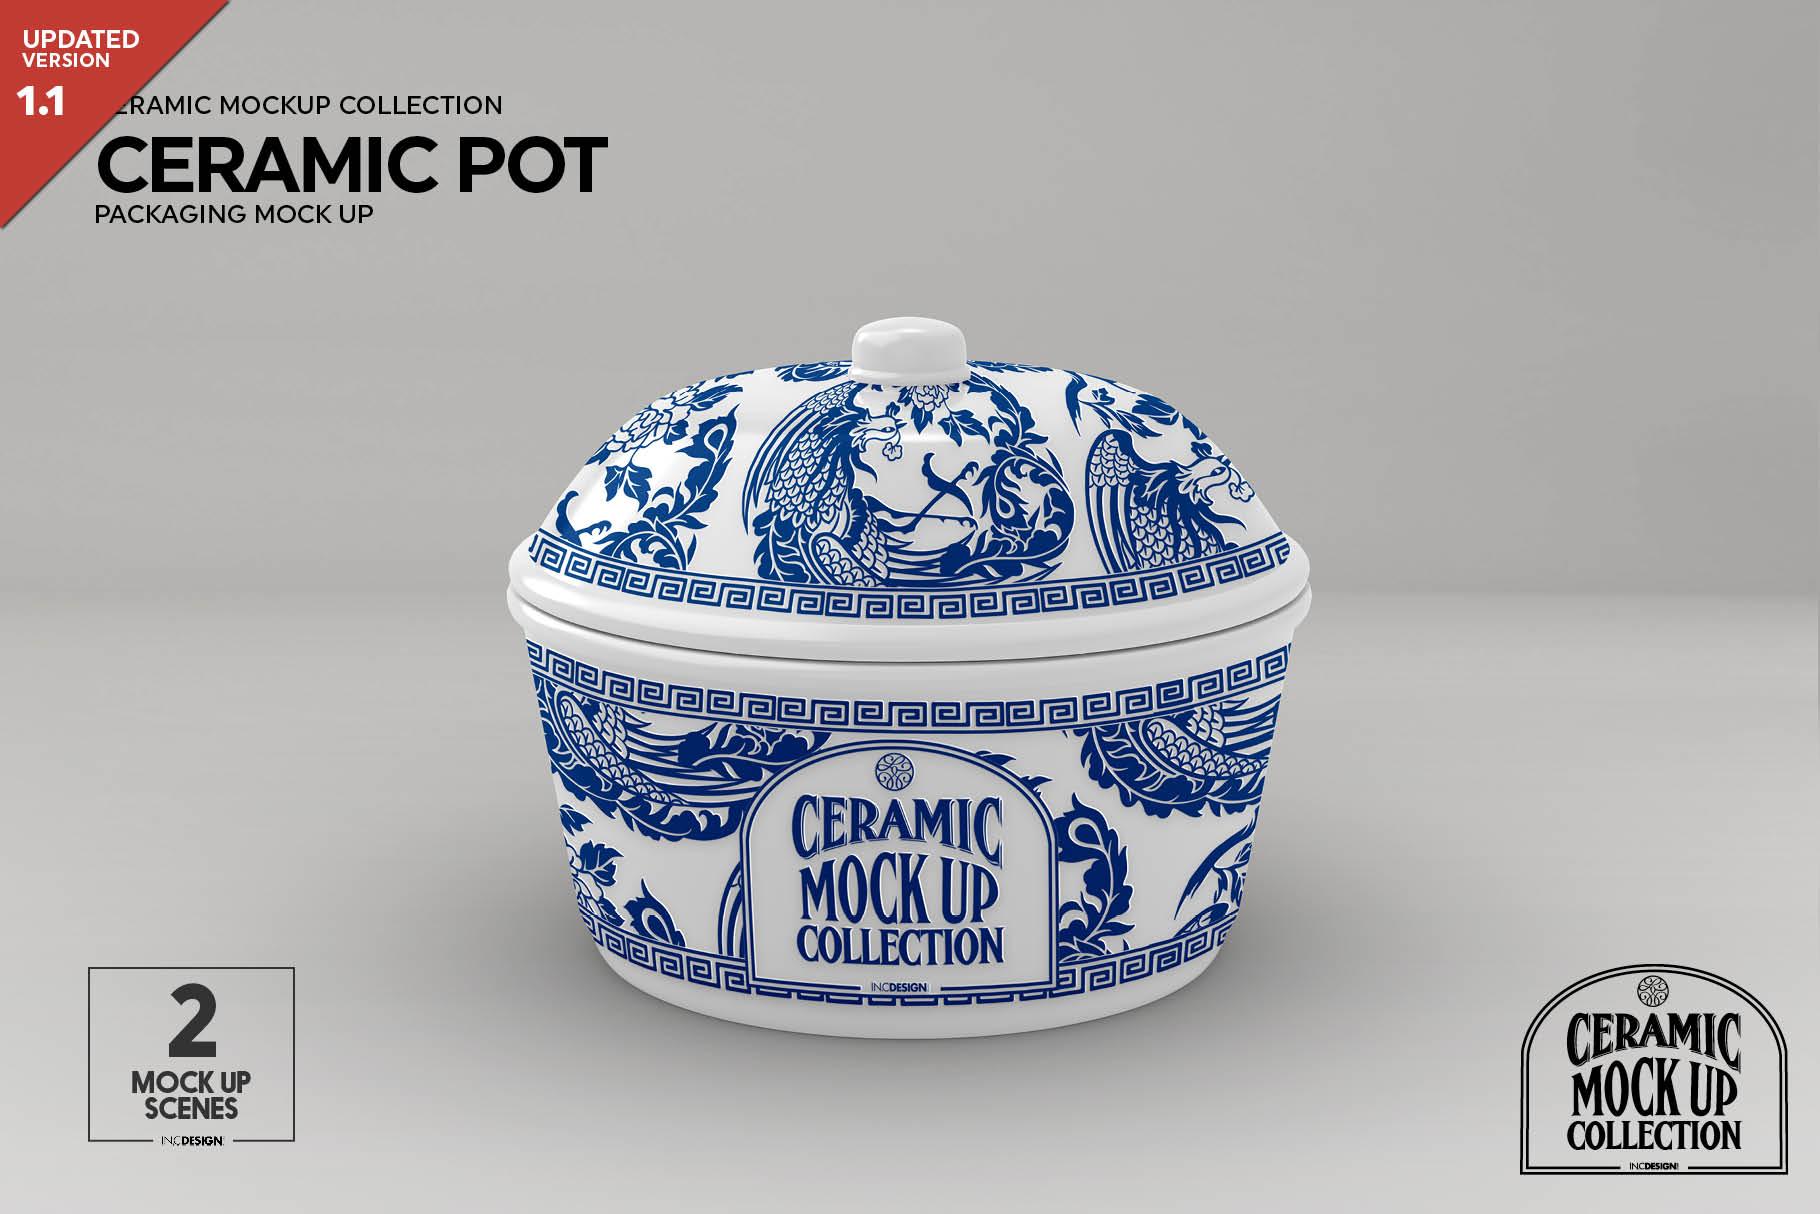 Ceramic Pot Packaging Mock Up example image 3